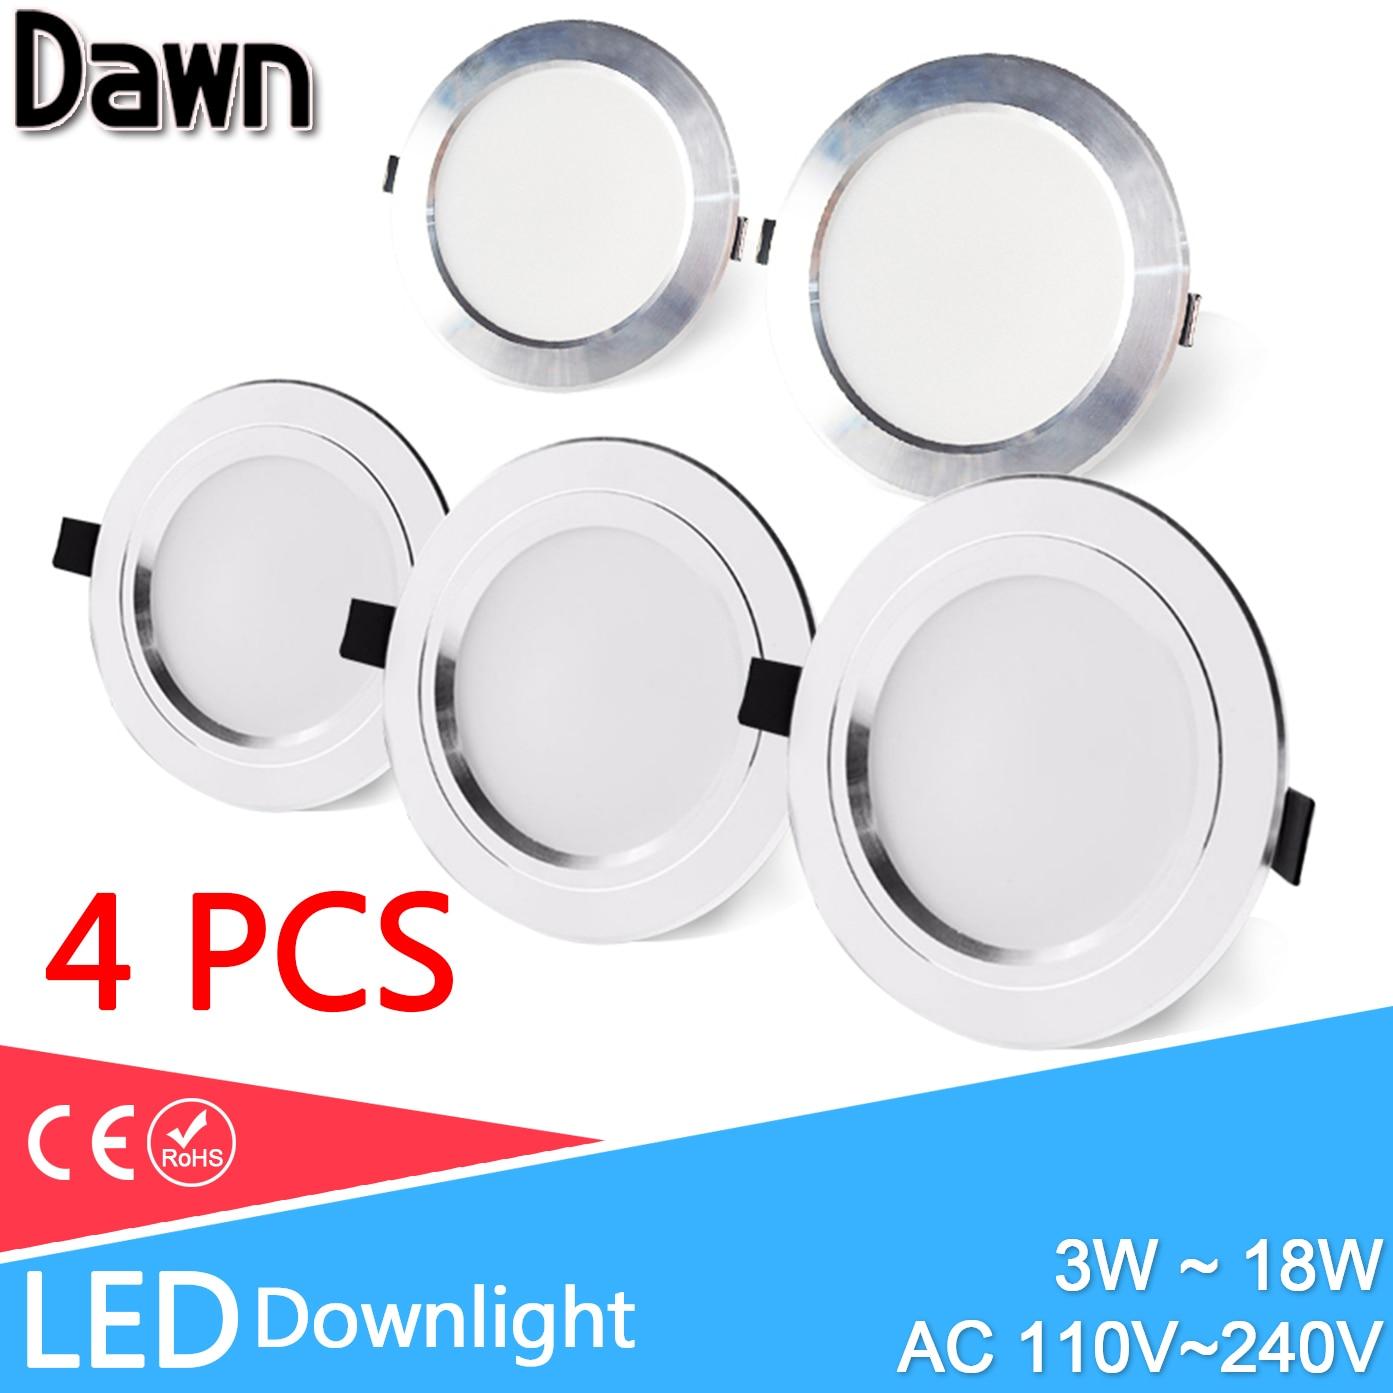 4pcs Ultra Thin LED Downlight 110V 220V Round LED Ceiling Recessed Spot Light Down Light 3W-18W 7W 9W 10W 12W 15W gd dimmable led recessed downlight 3w 5w 7w 10w 12w 15w 20w 24w spot led ceiling down light 110v 220v 230v cob led downlight